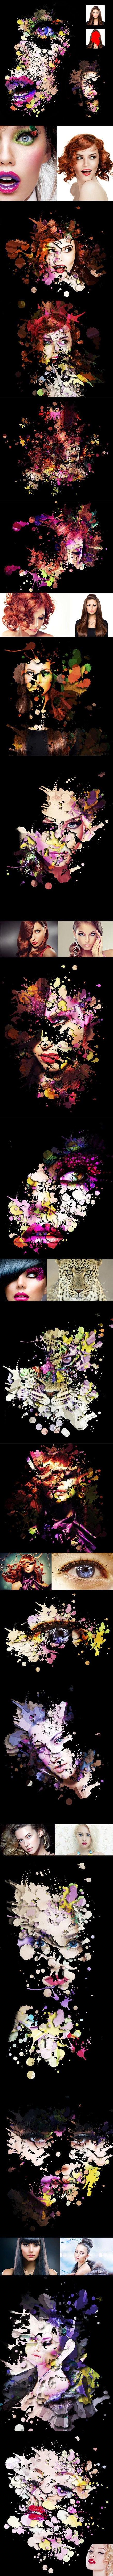 63 VSCO Photoshop Actions: Artistic Actions Bundle - just $9 - 1 2